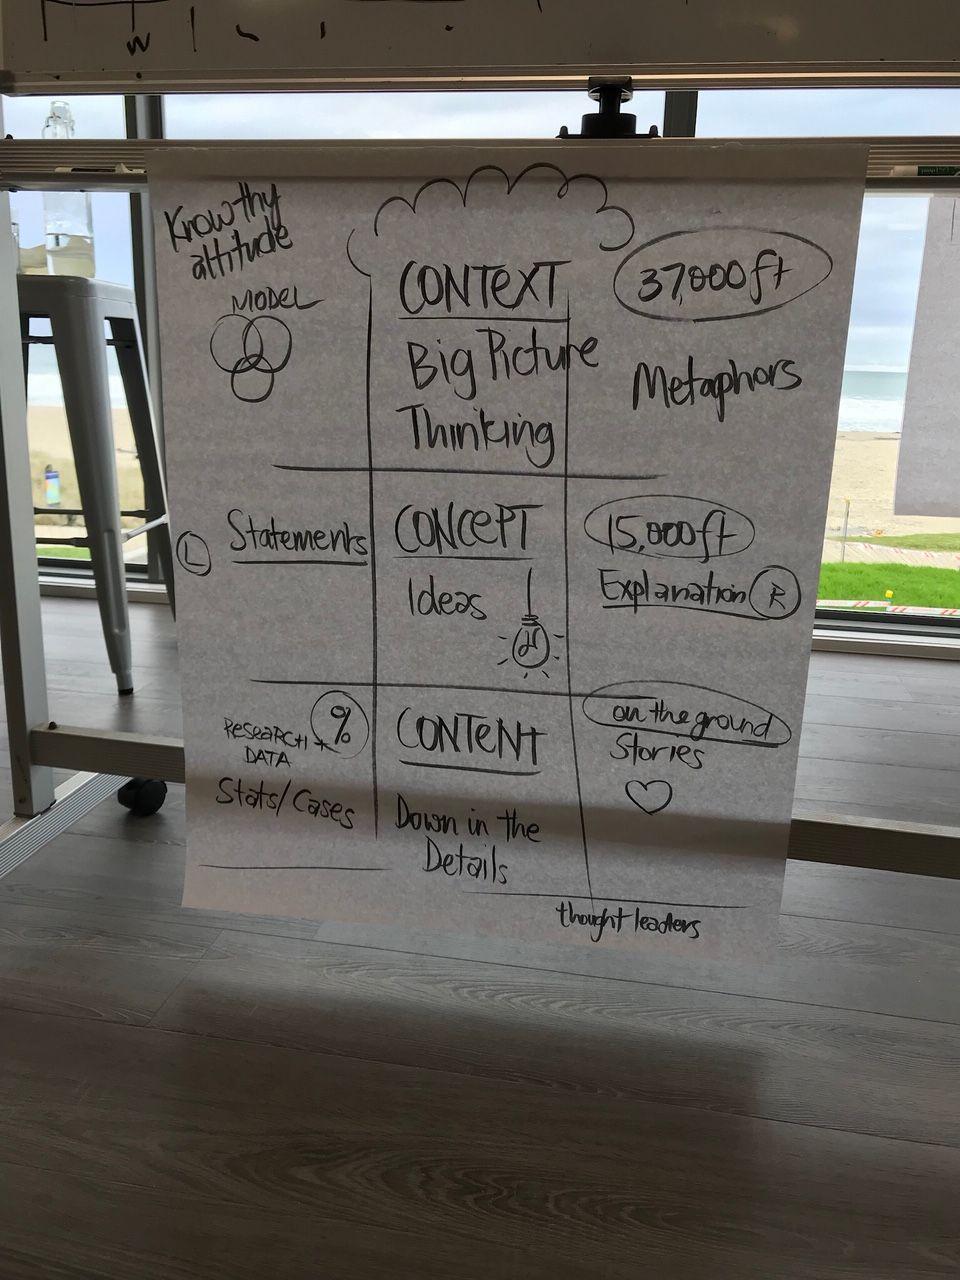 Positioning ideas visually